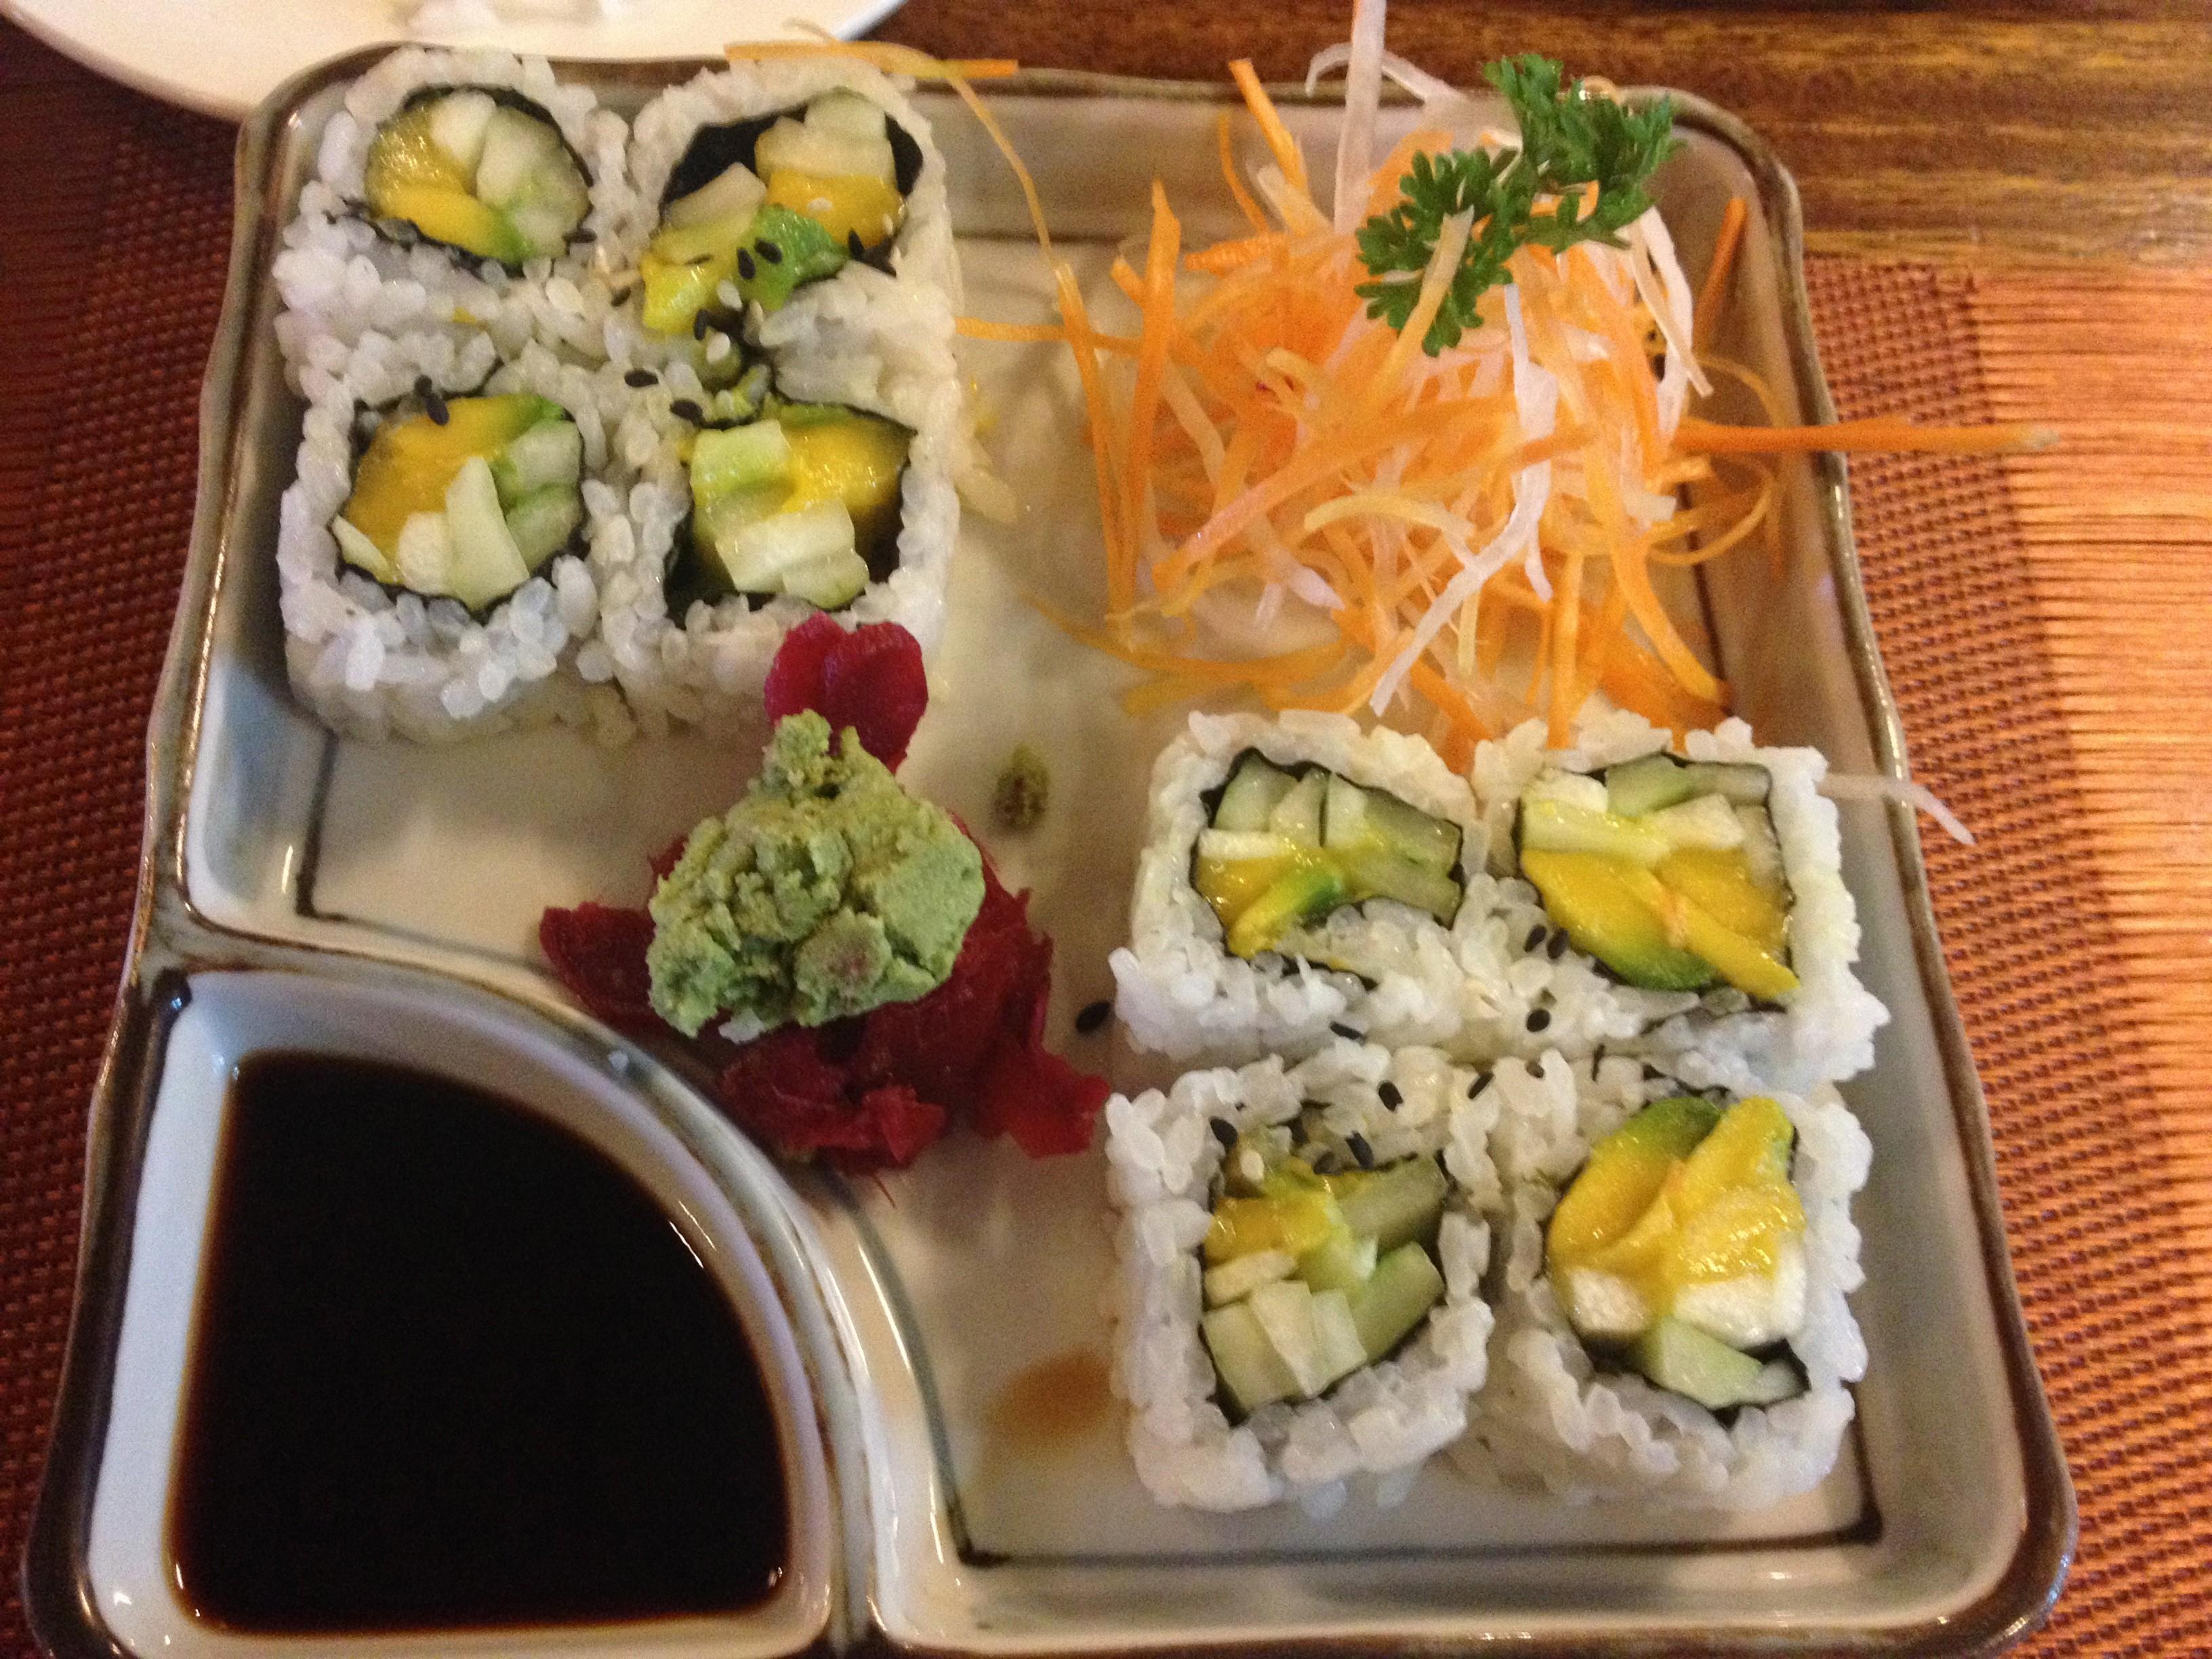 L'ottimo sushi vegetariano da Lab-as, a Dumaguete.